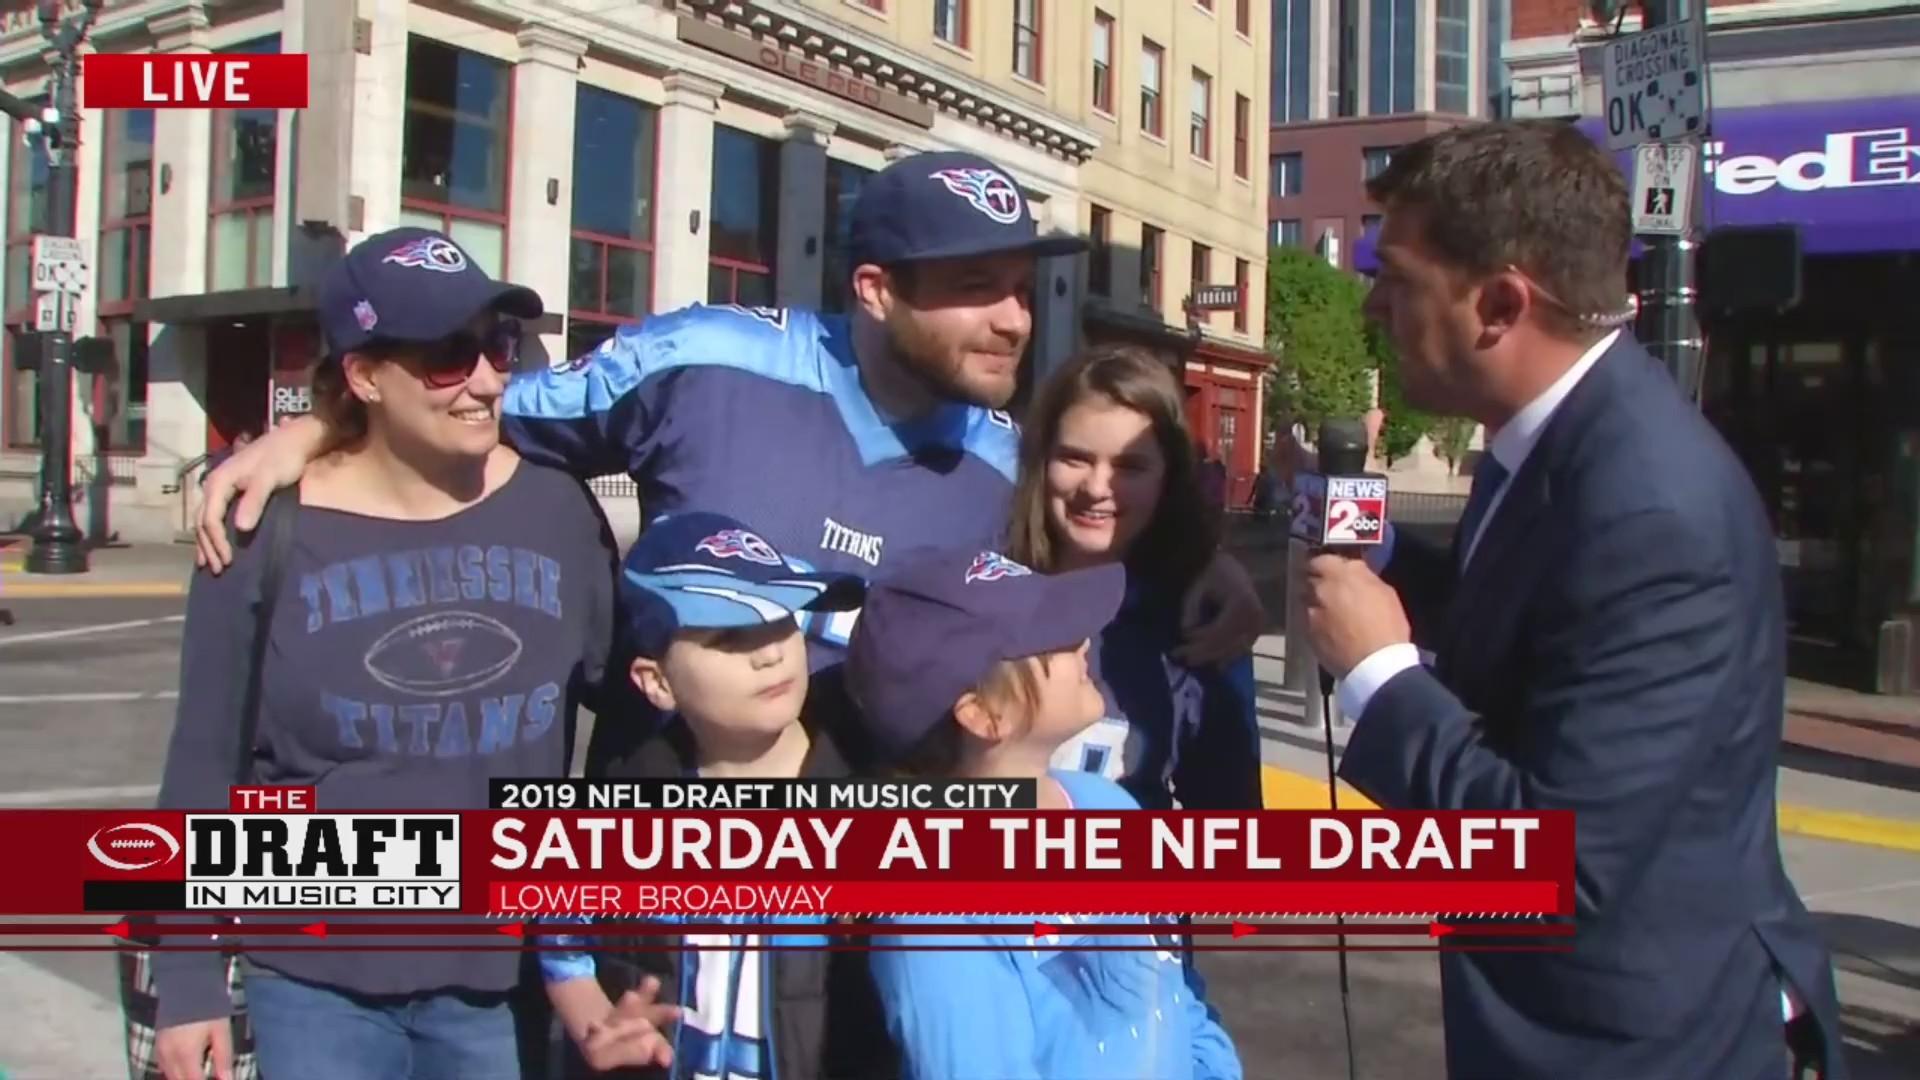 NFL Draft fans, marathon runners converge on Lower Broadway